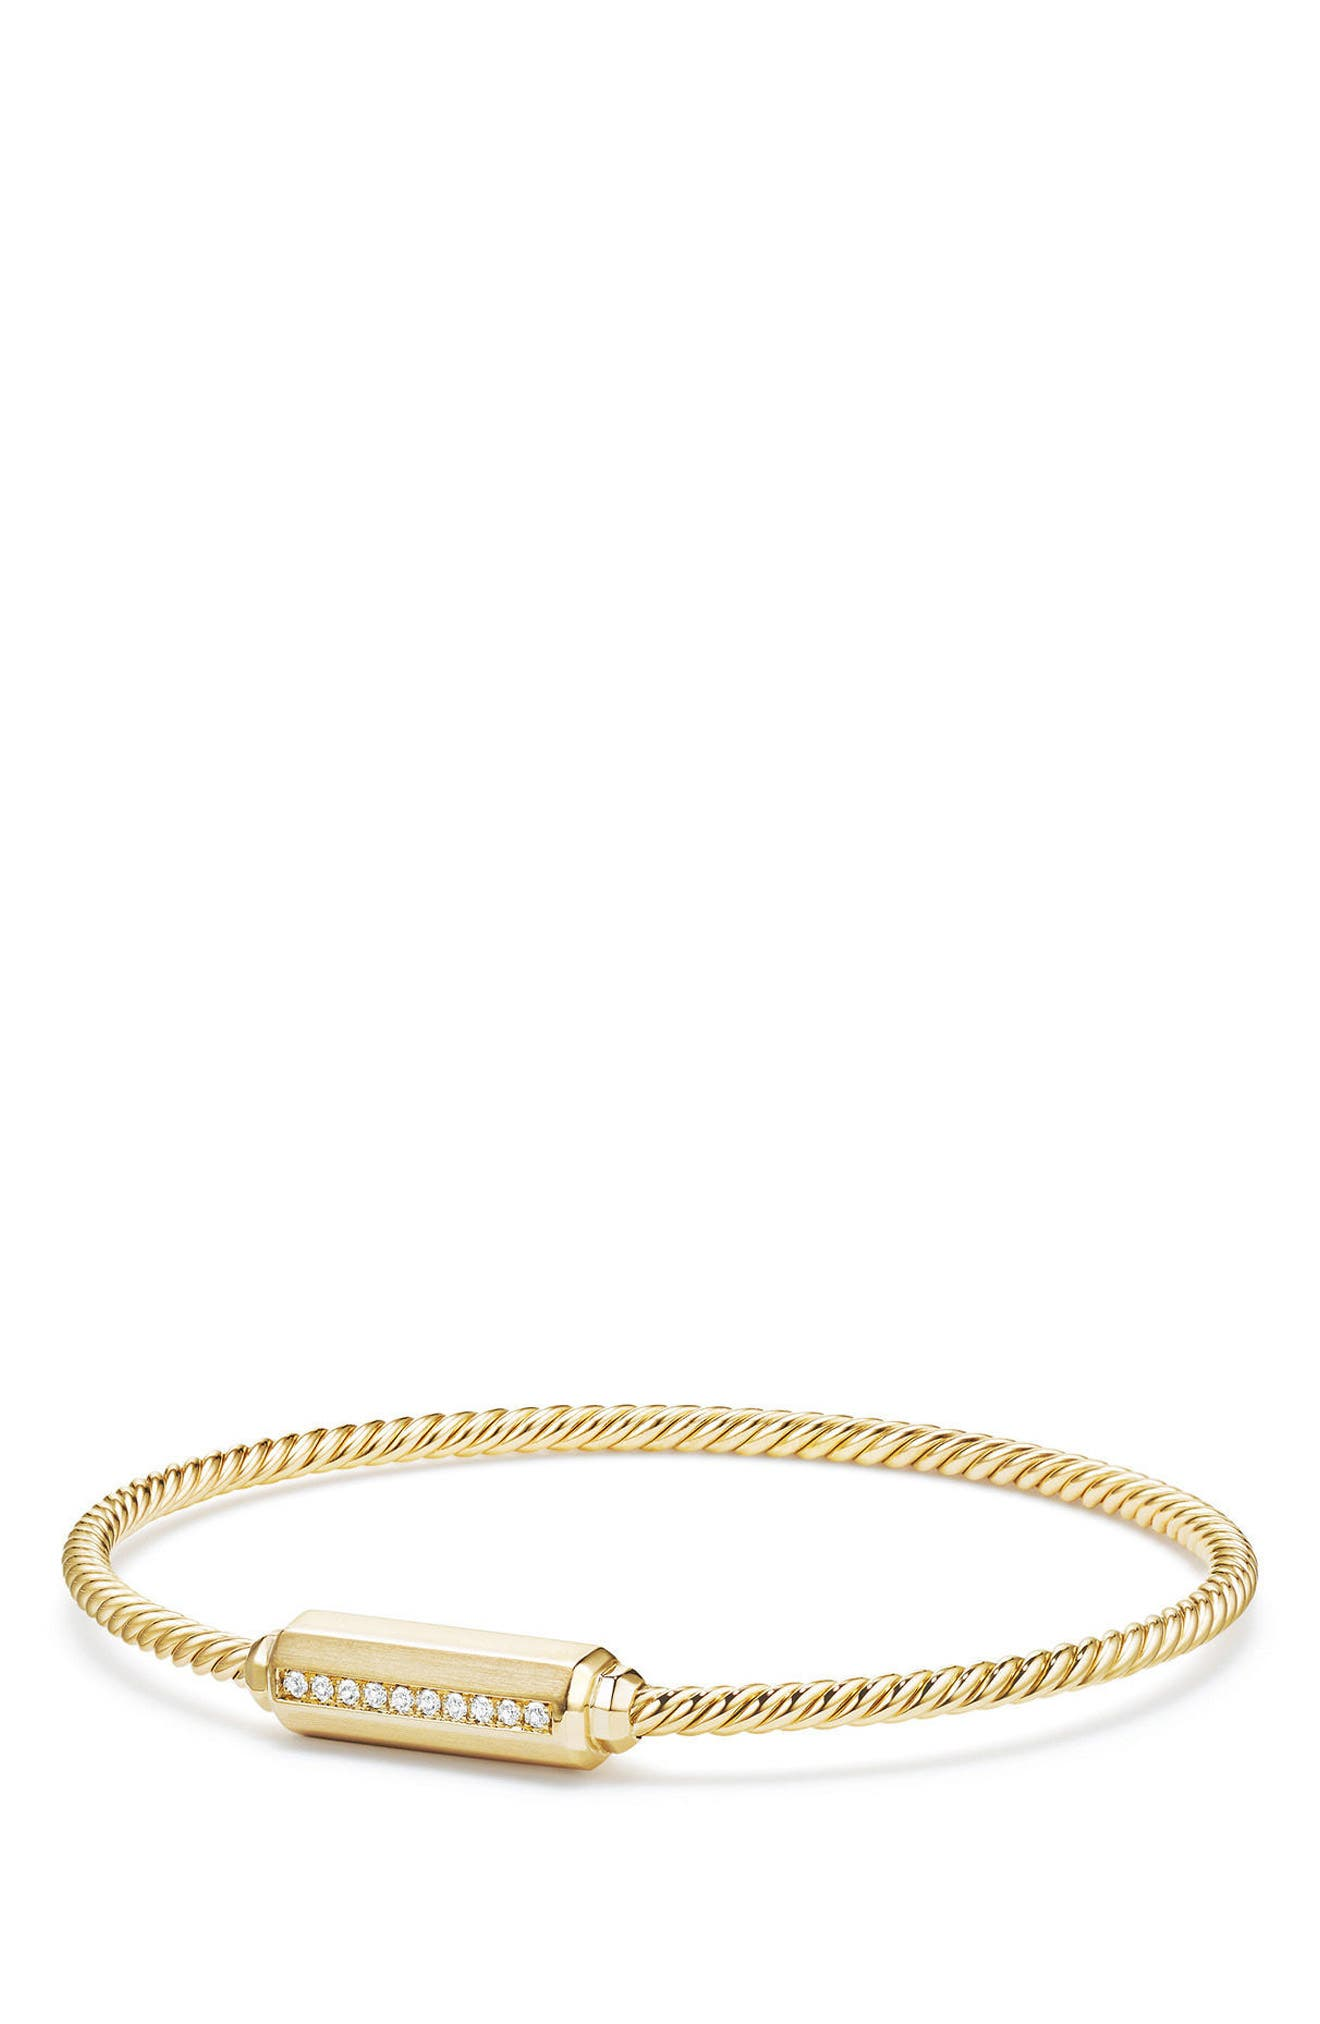 Alternate Image 1 Selected - David Yurman Barrels Bracelet with Diamonds in 18K Gold